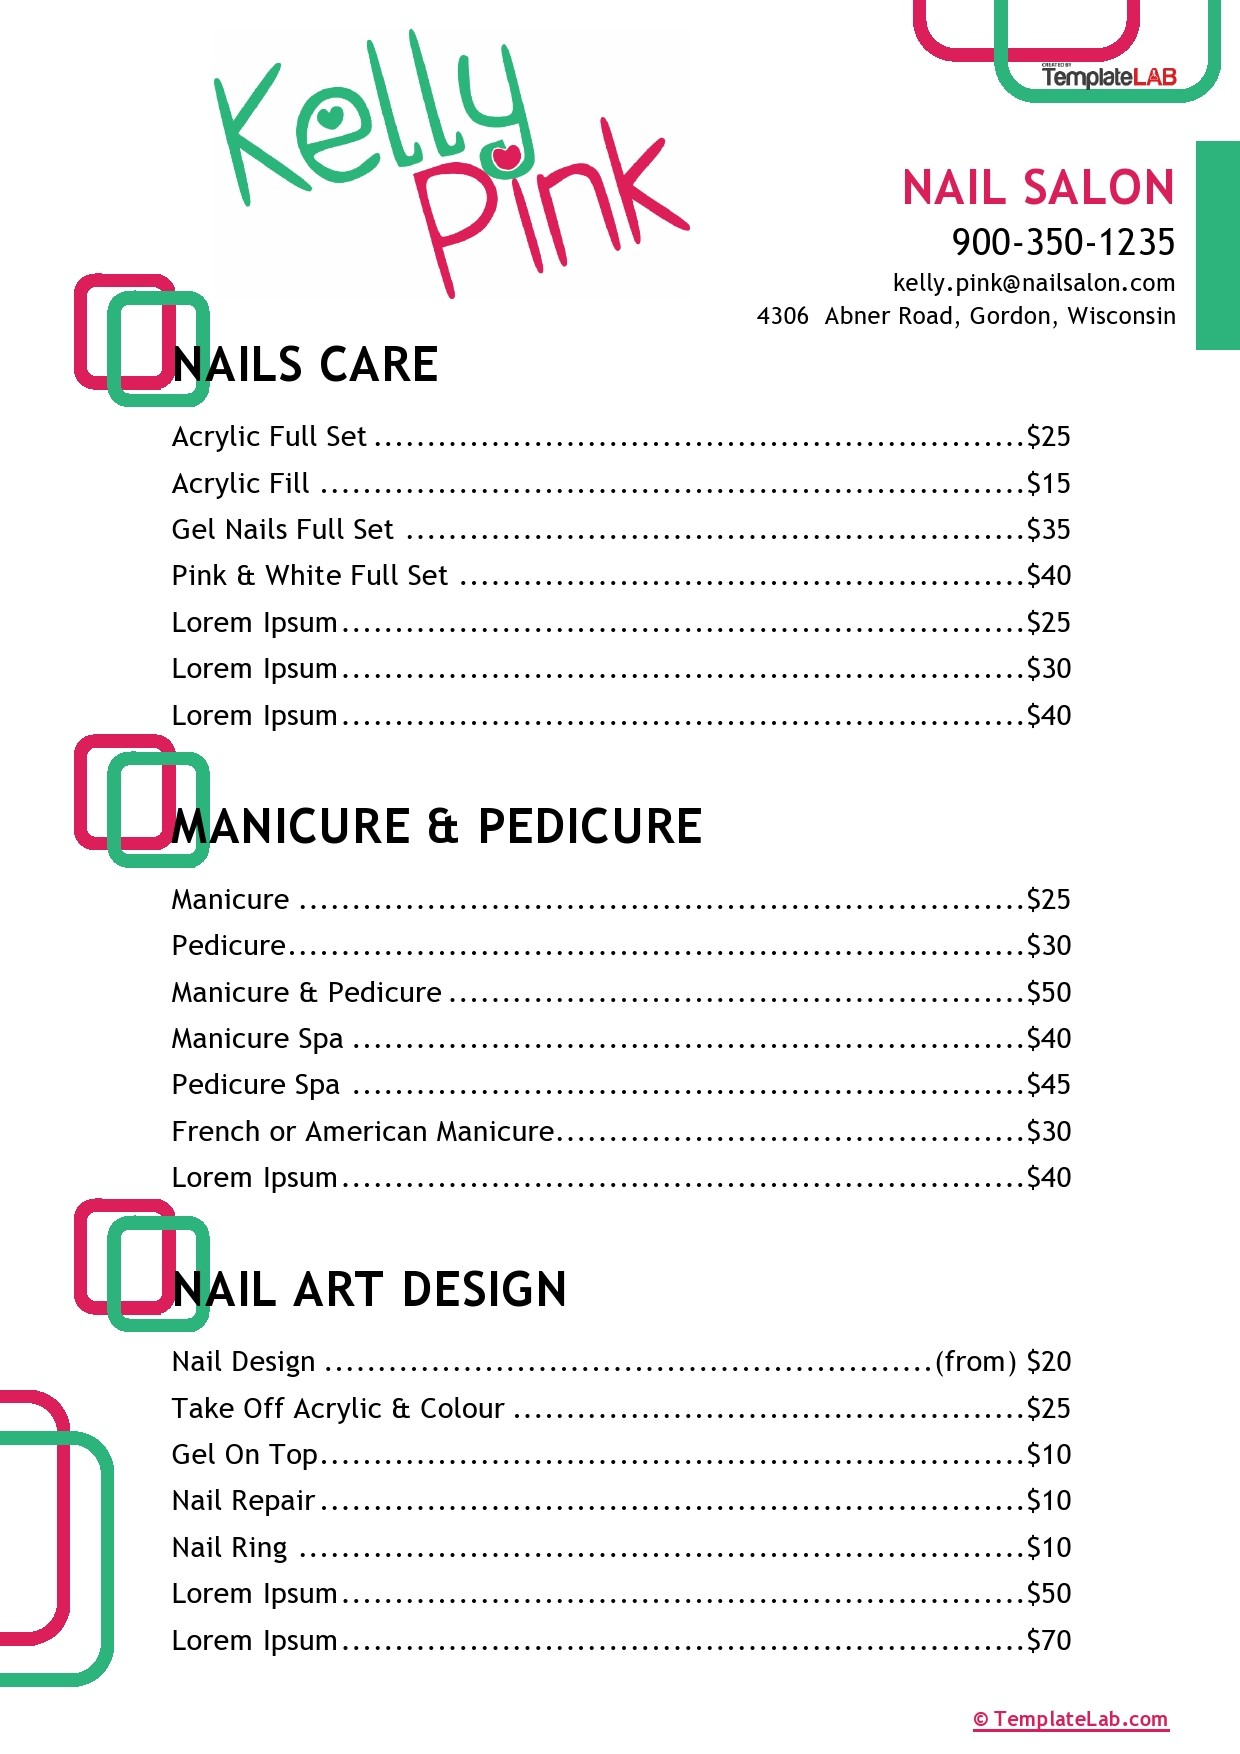 Free Nail Salon Price List Template - TemplateLab.com